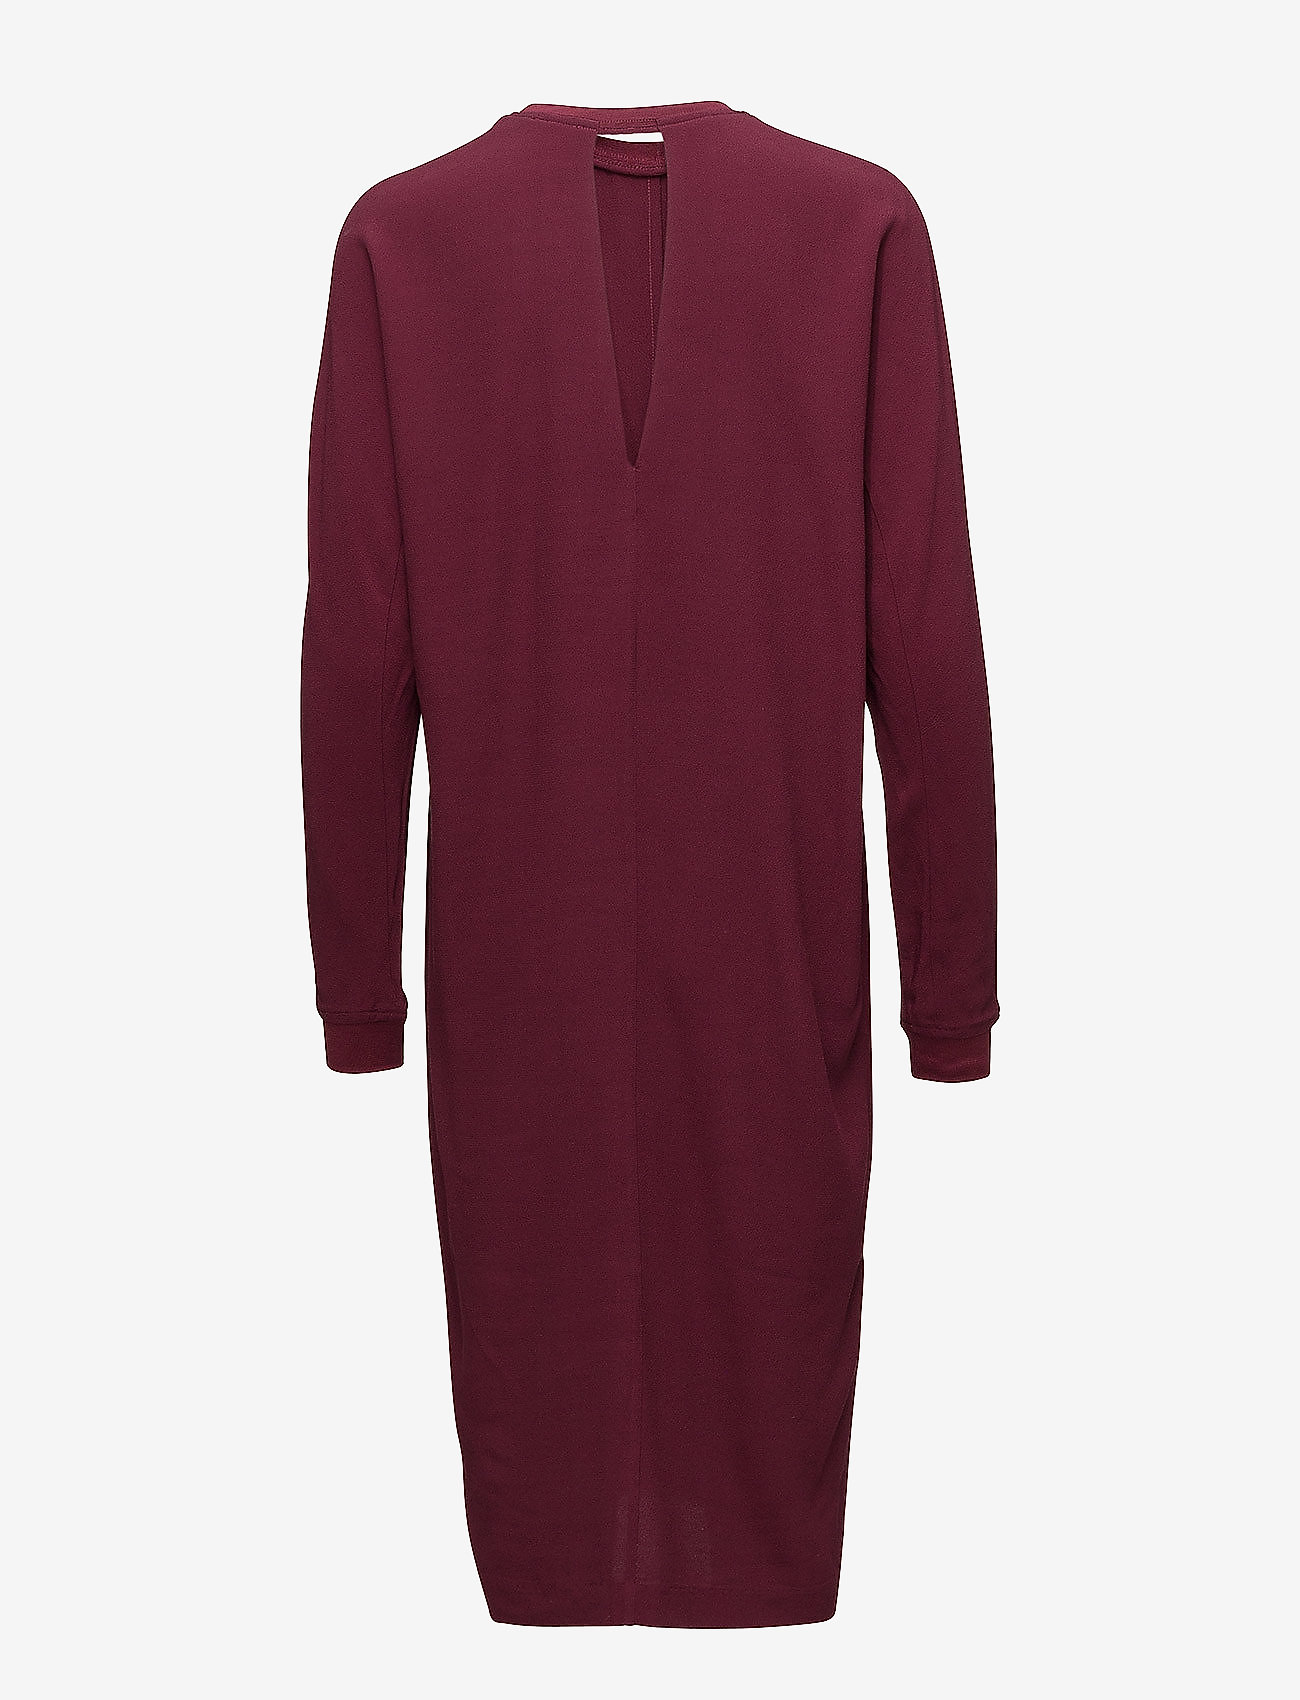 J. Lindeberg - Noelle Drapy Crepe - short dresses - burgundy - 1